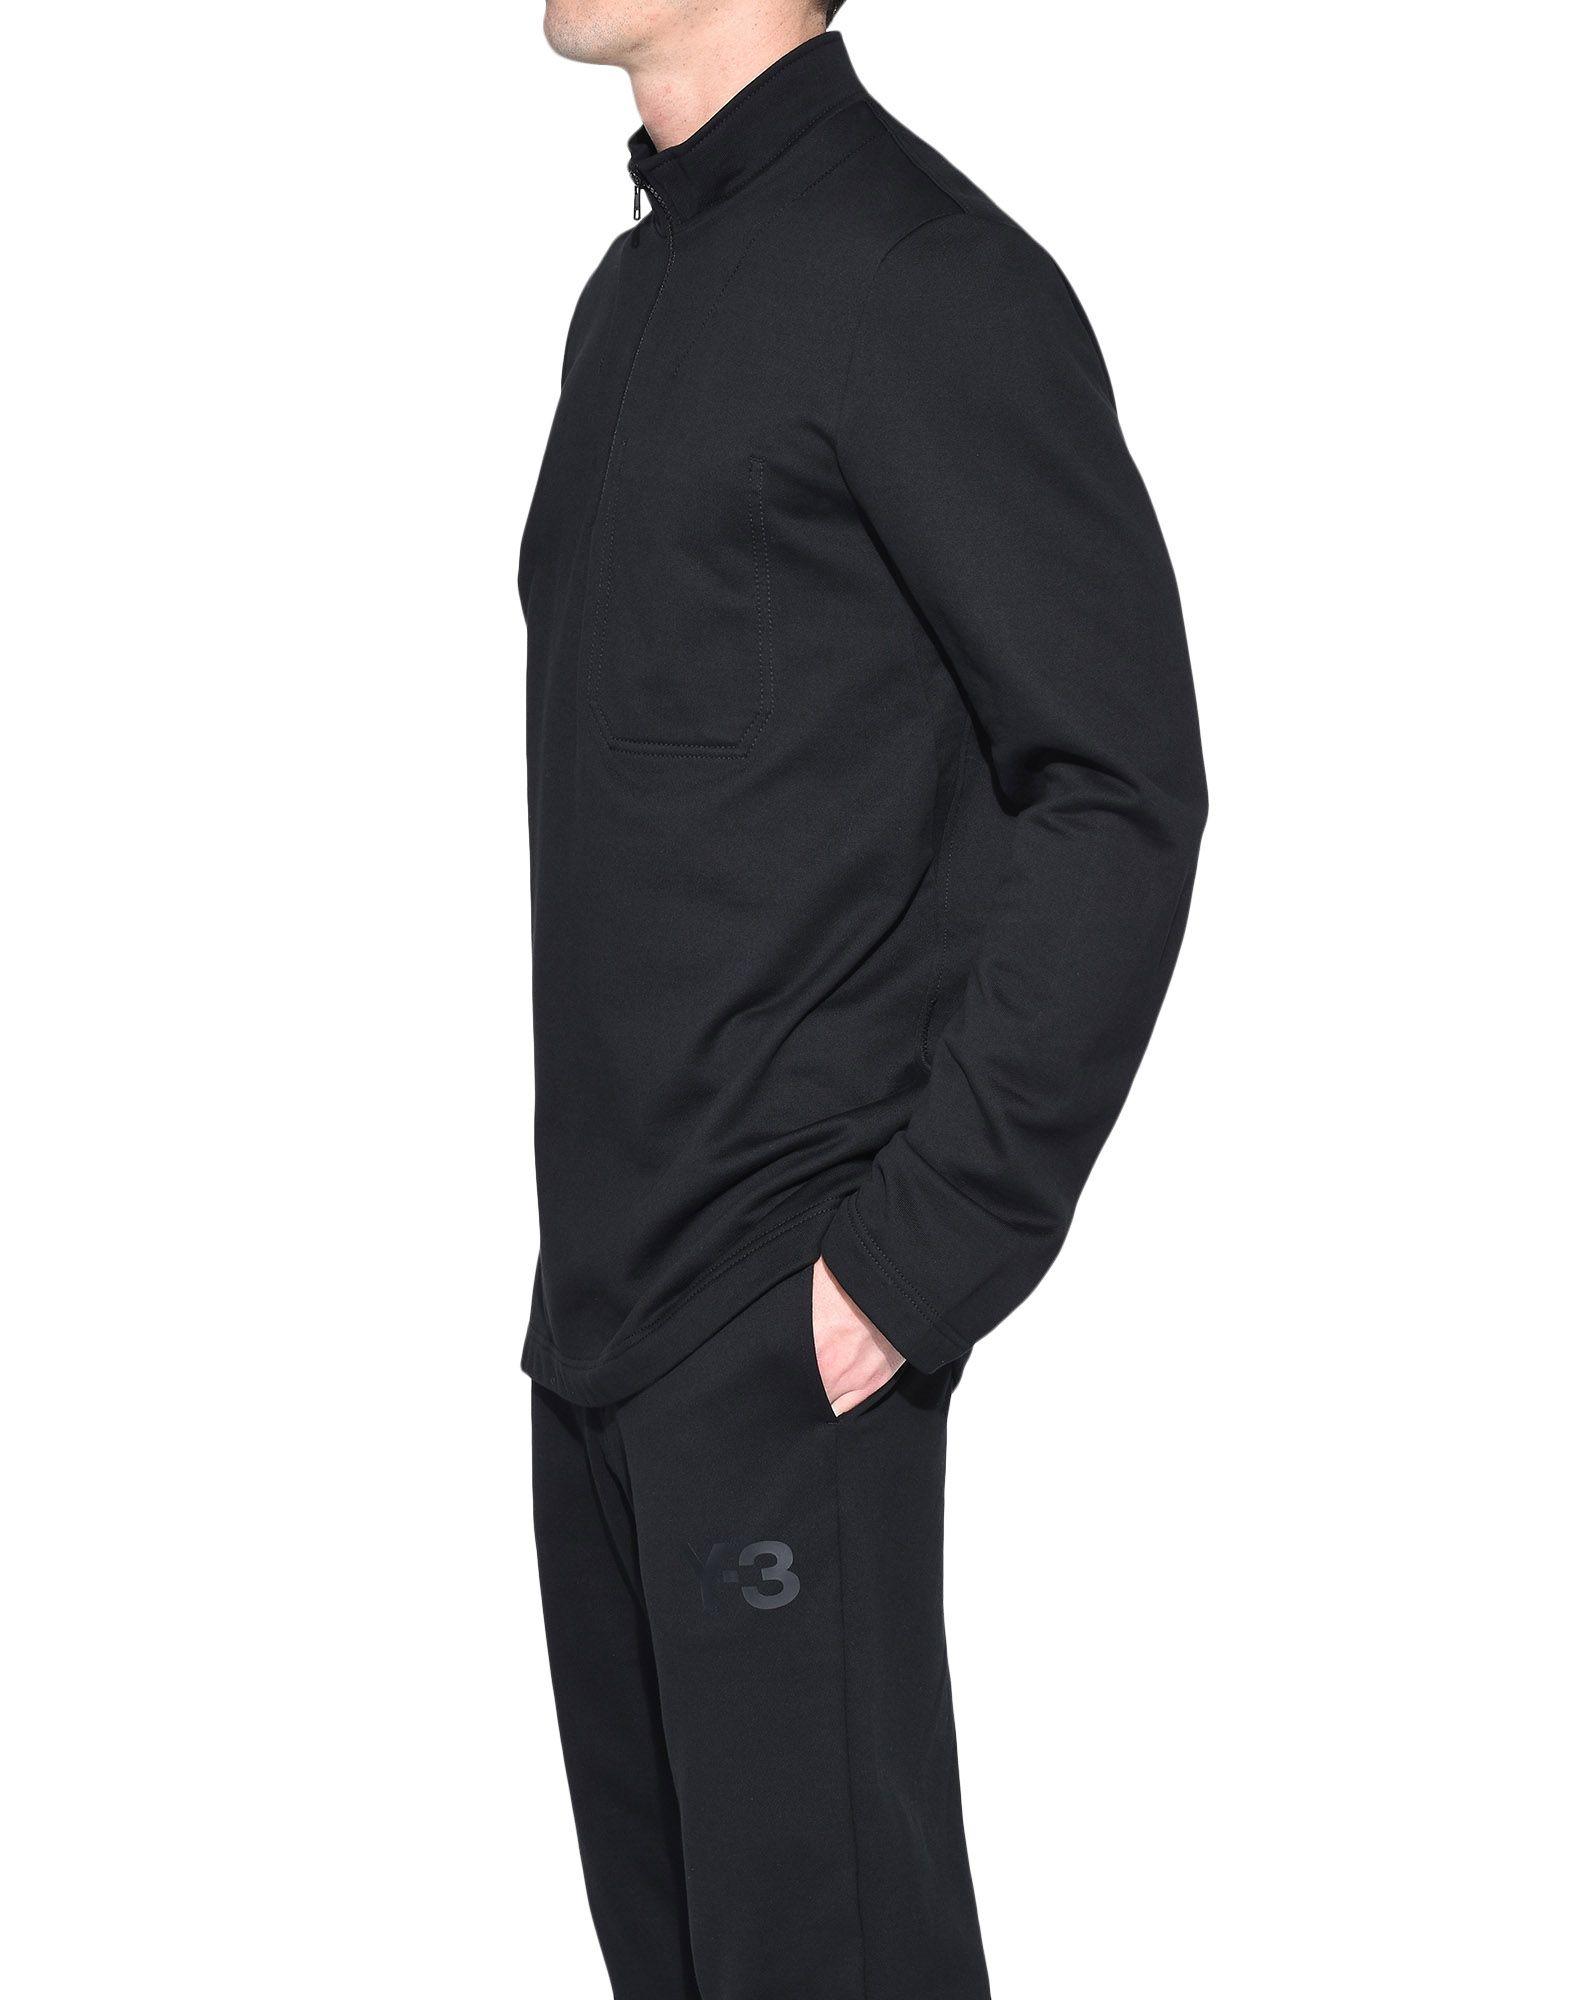 Y-3 Y-3 Sashiko Sweater Sweatshirt mit Zipp Herren e